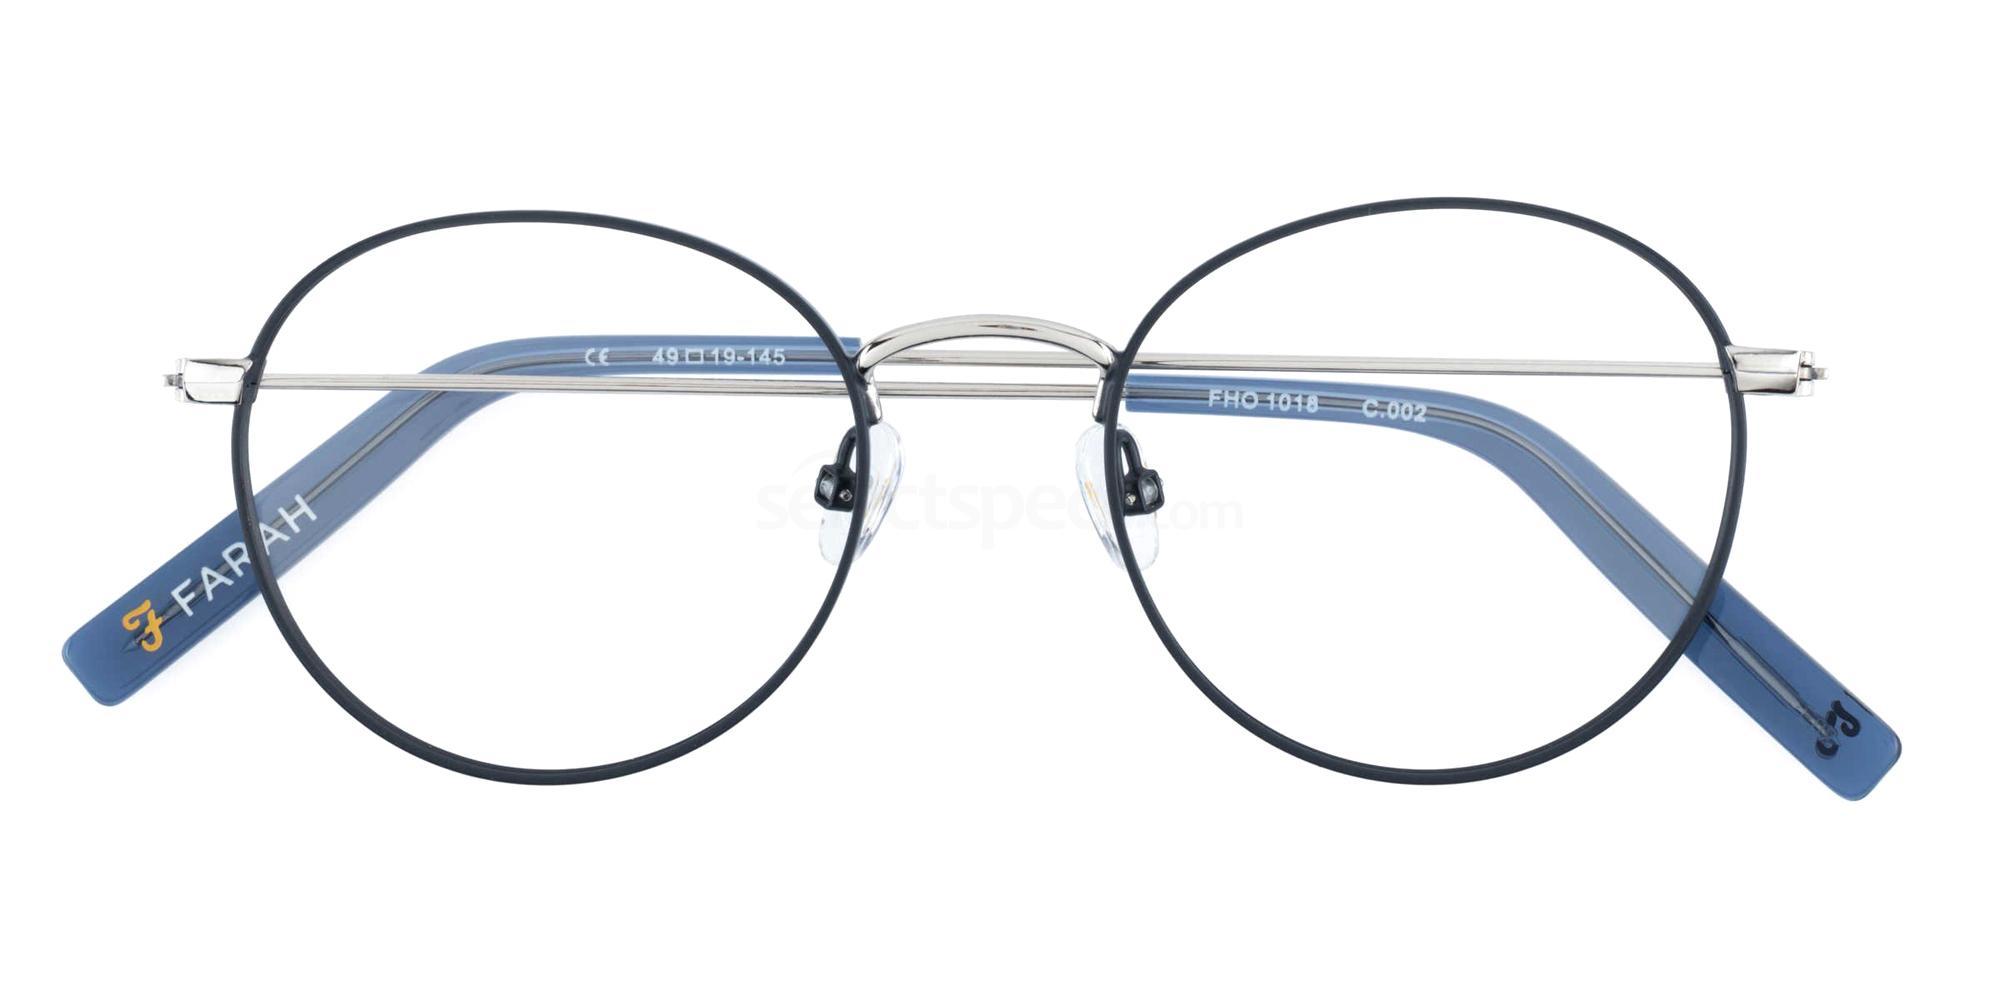 002 FHO-1018 Glasses, Farah